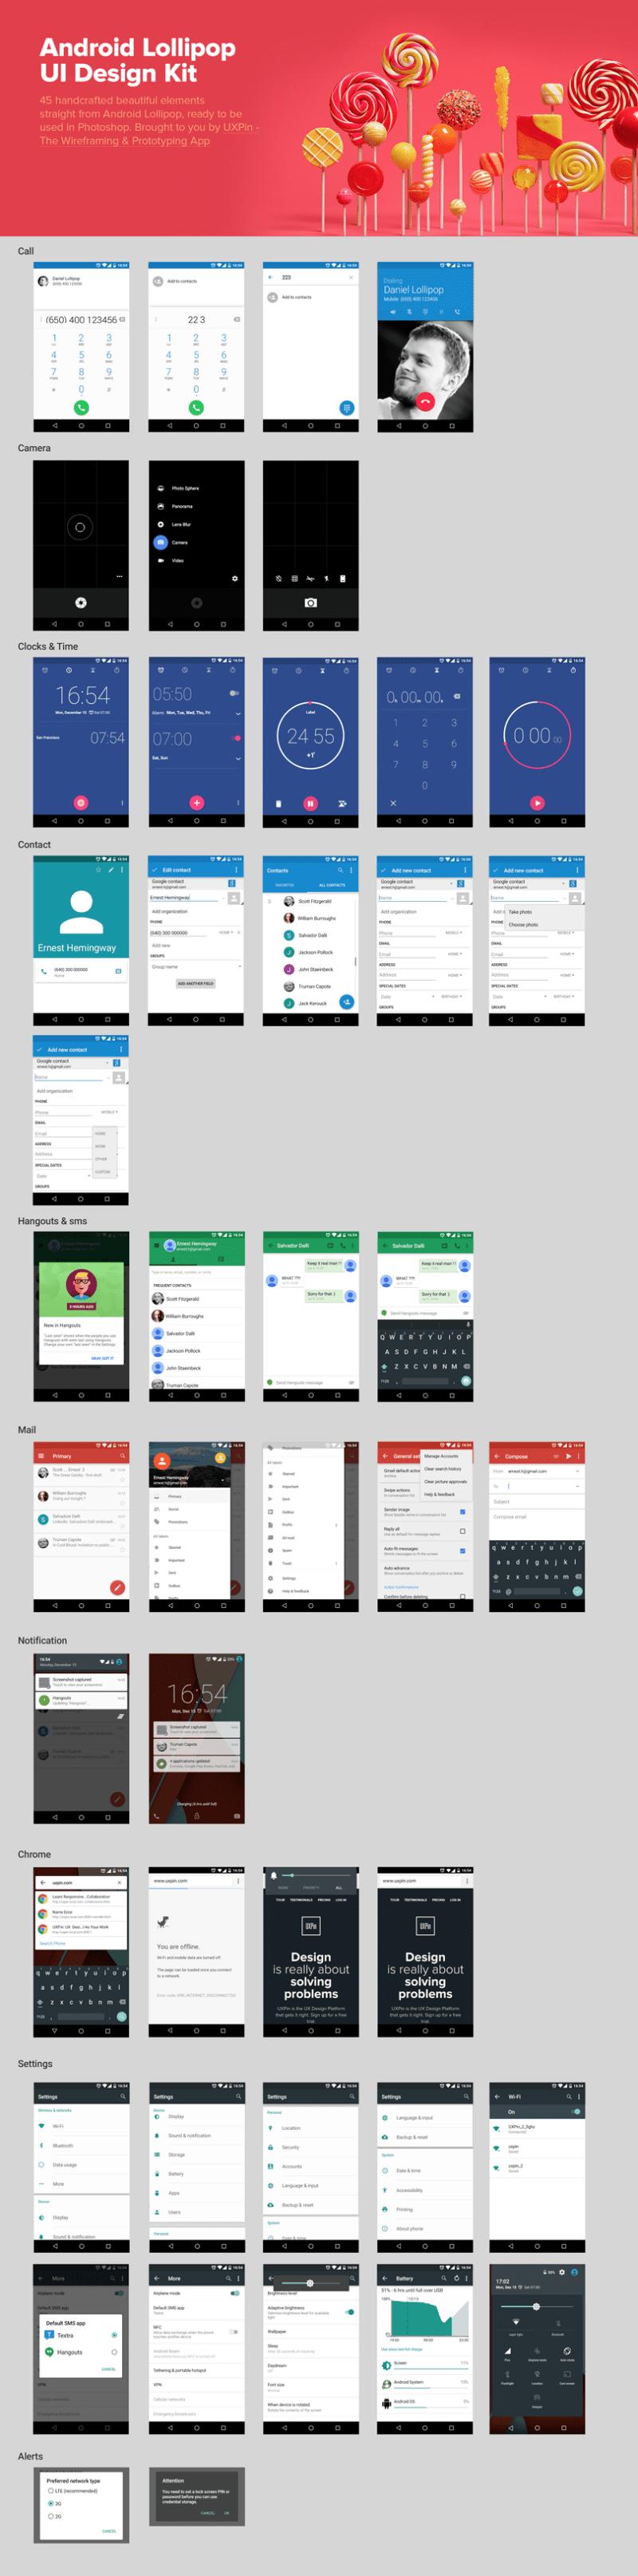 Скачать подборку шаблонов Android-приложений — Lollipop Kit